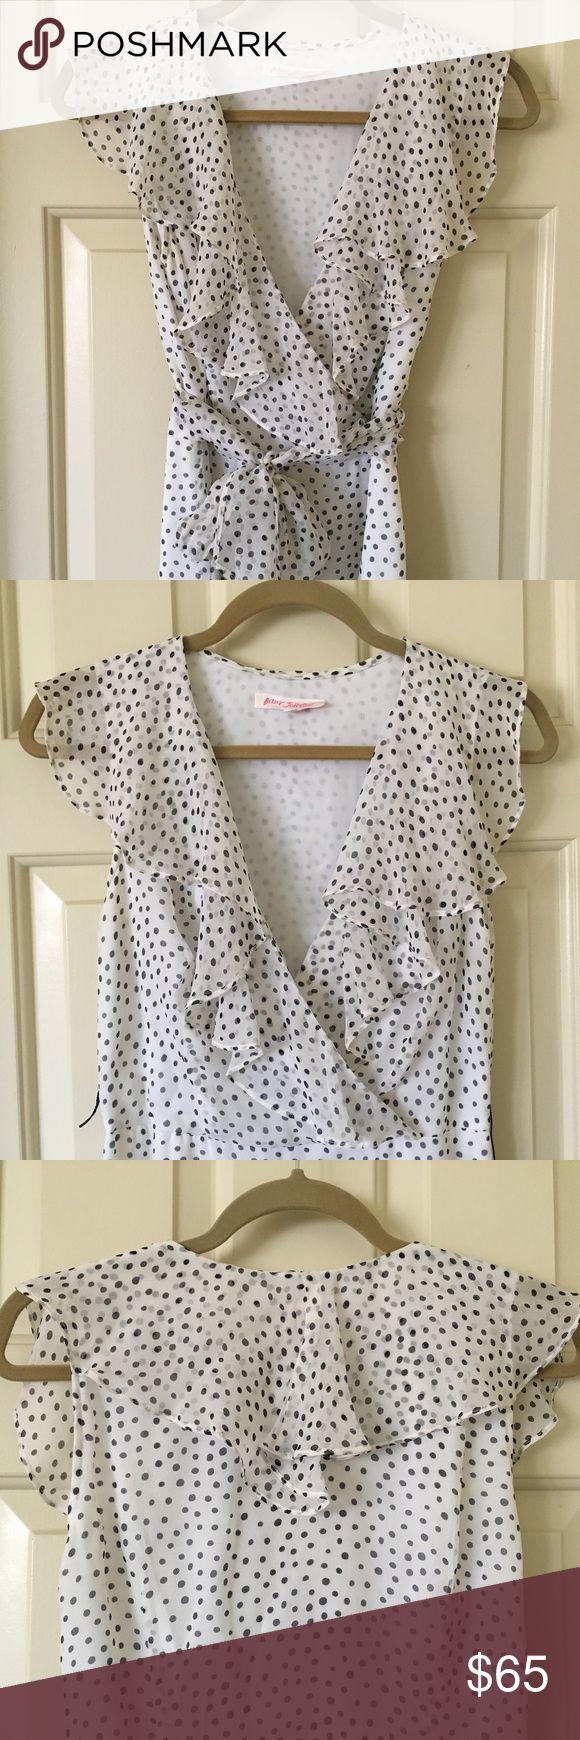 Betsey Johnson Polka Dot Dress Flouncy Betsey Johnson Polka Dot Dress - perfect for a summer night out. Betsey Johnson Dresses Midi